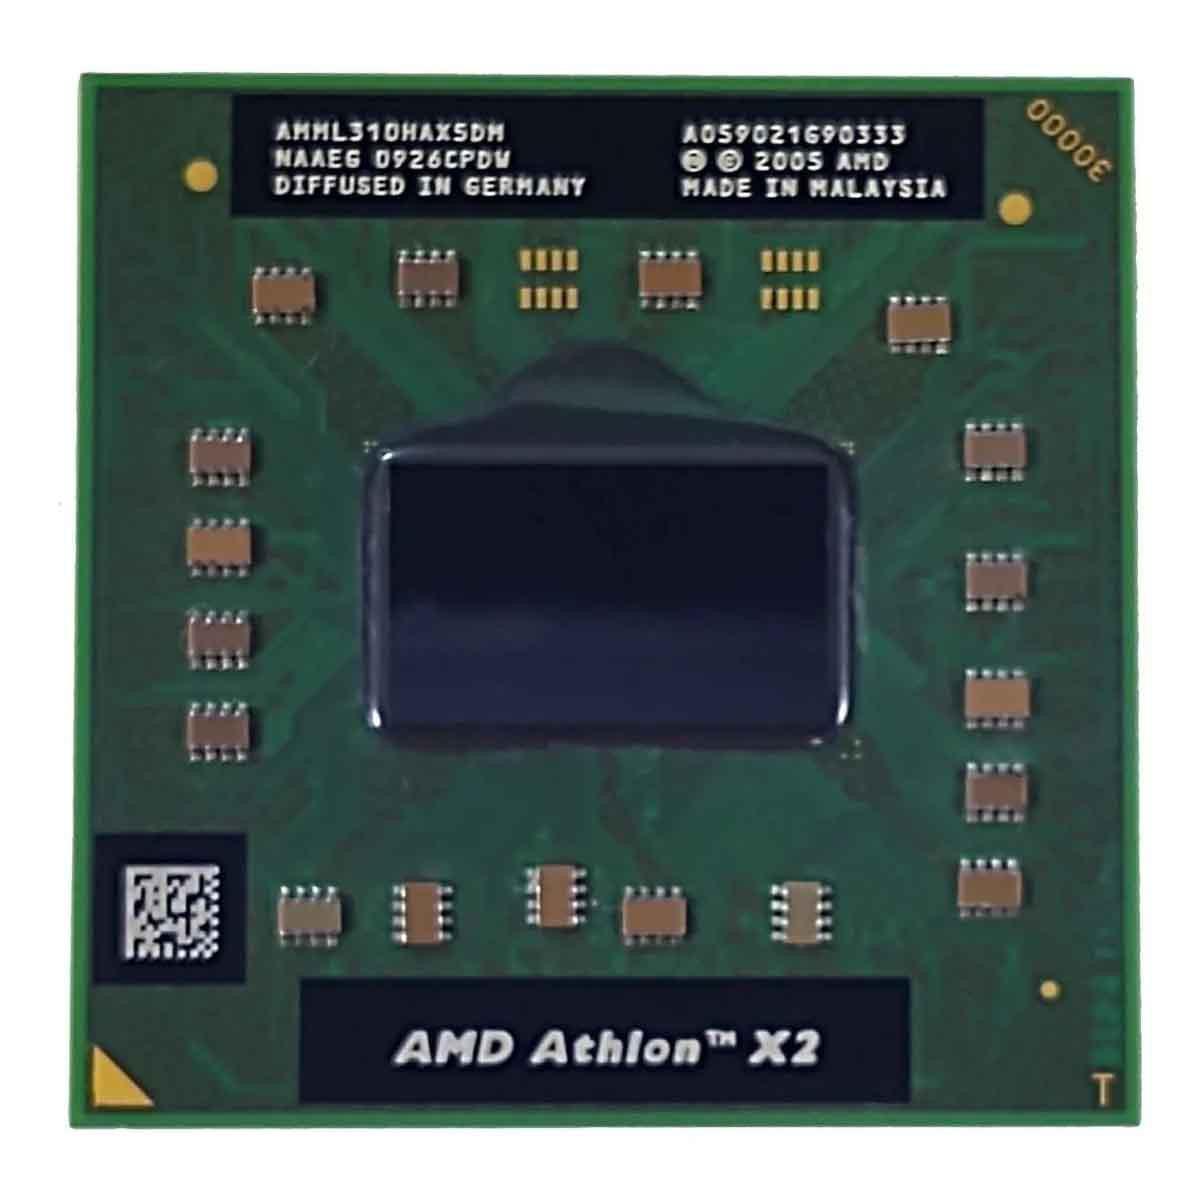 Processador P/ Notebook Amd Athlon X2 1.2ghz PN:Amml310hax5dm - Retirado